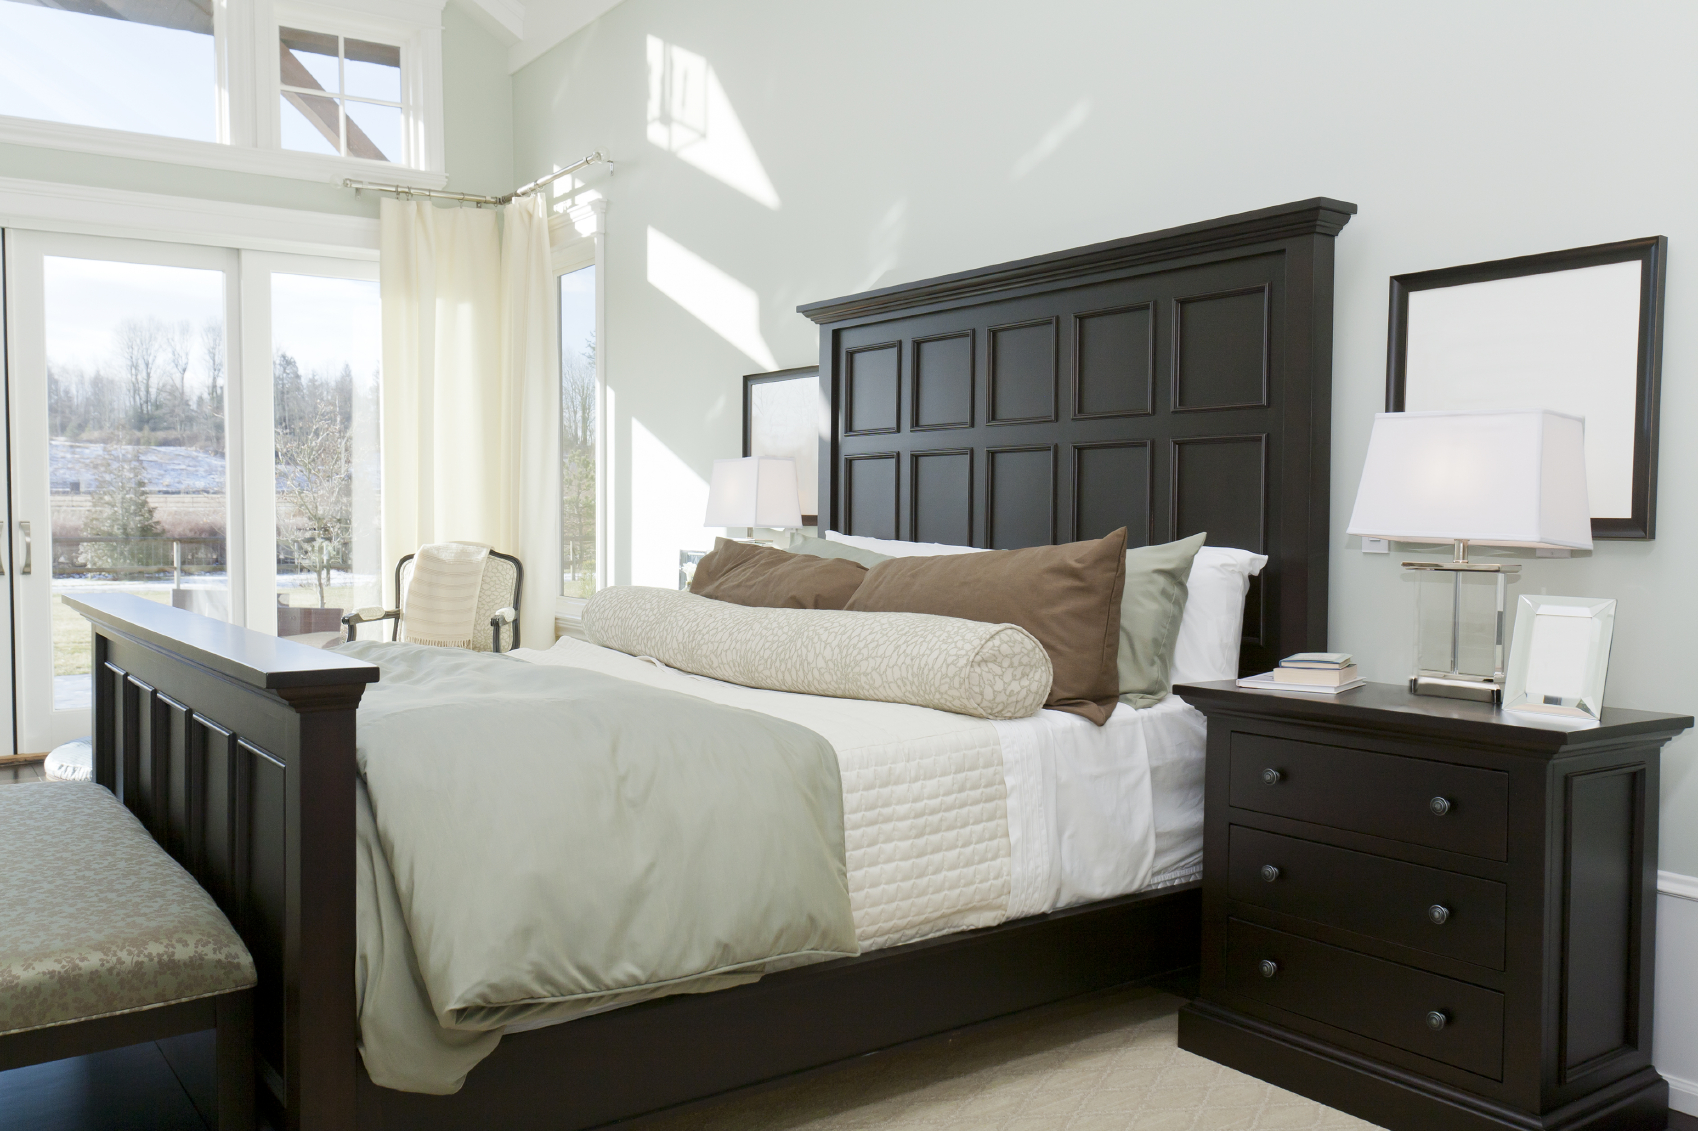 Bed bug bedroom.jpg